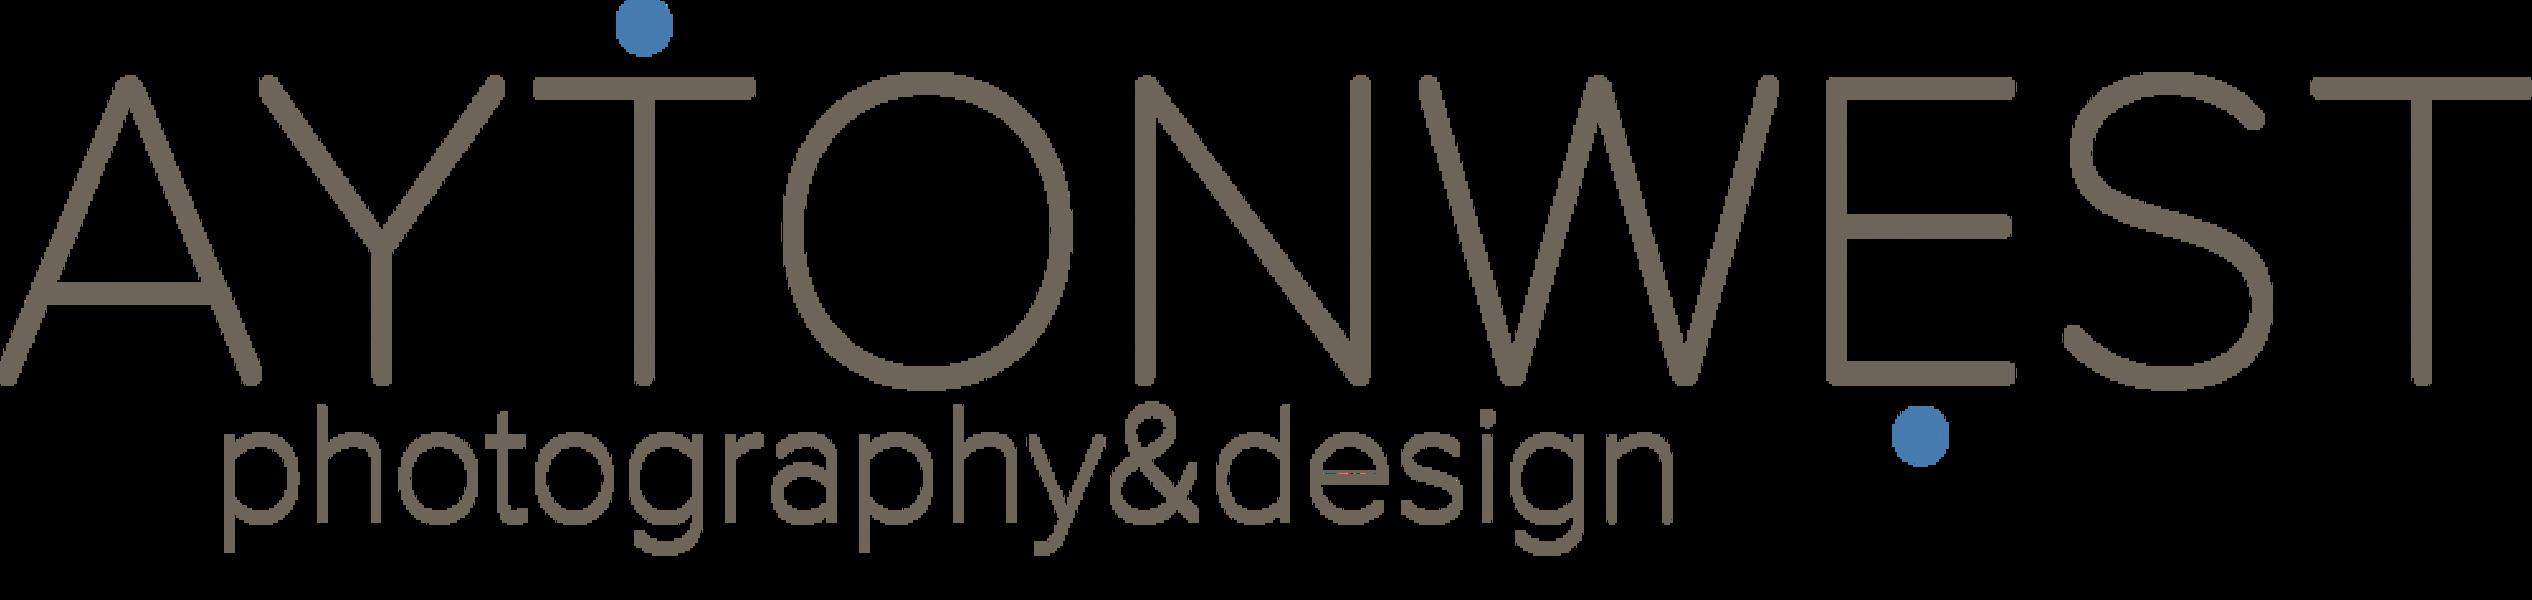 Thumbnail 20190103 125243 aytonwest logo2018